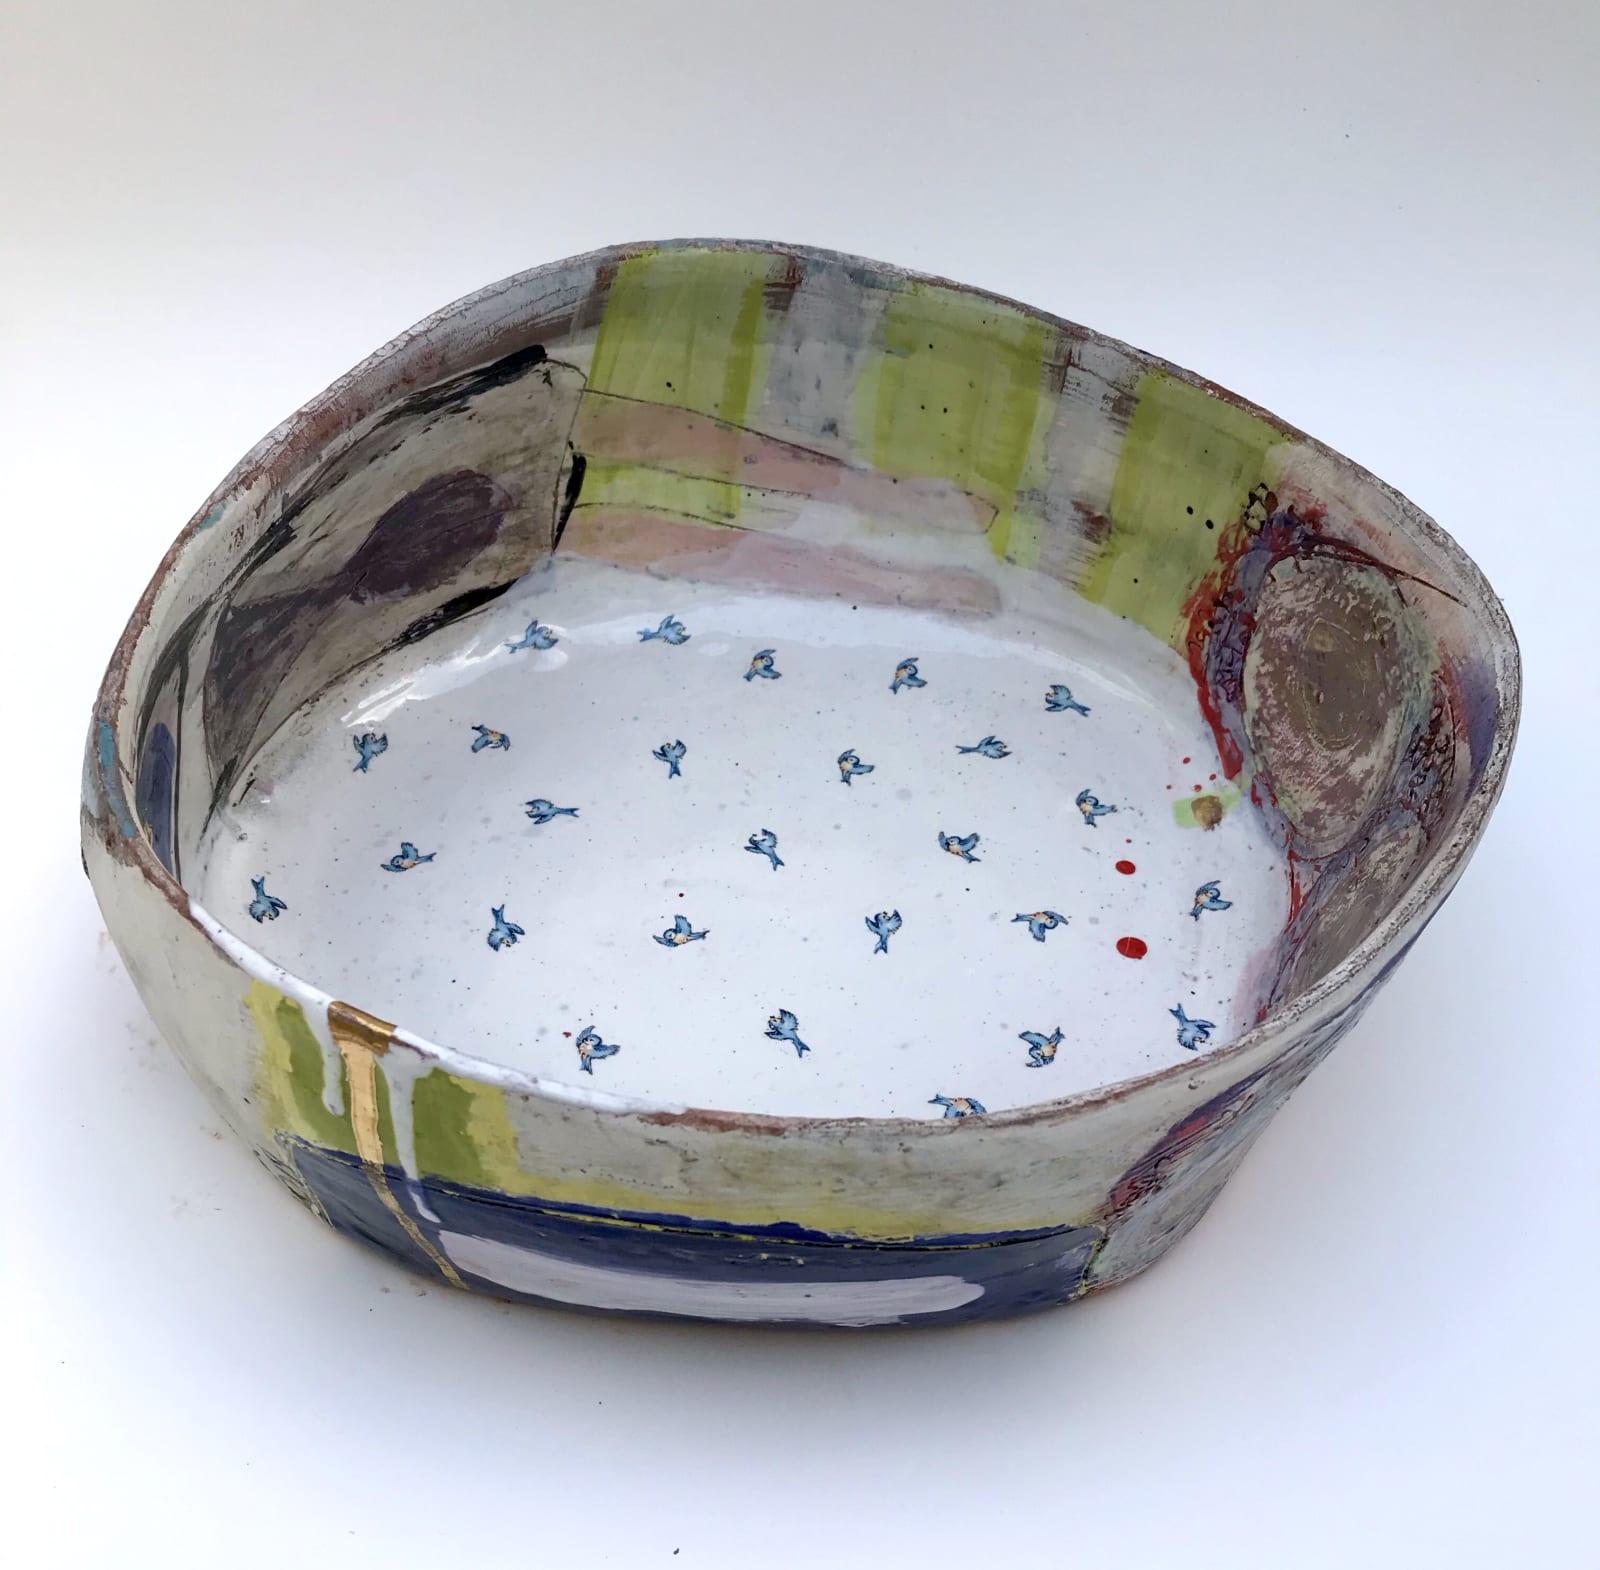 Linda Styles, Pretty Figurative Bowl, 2019